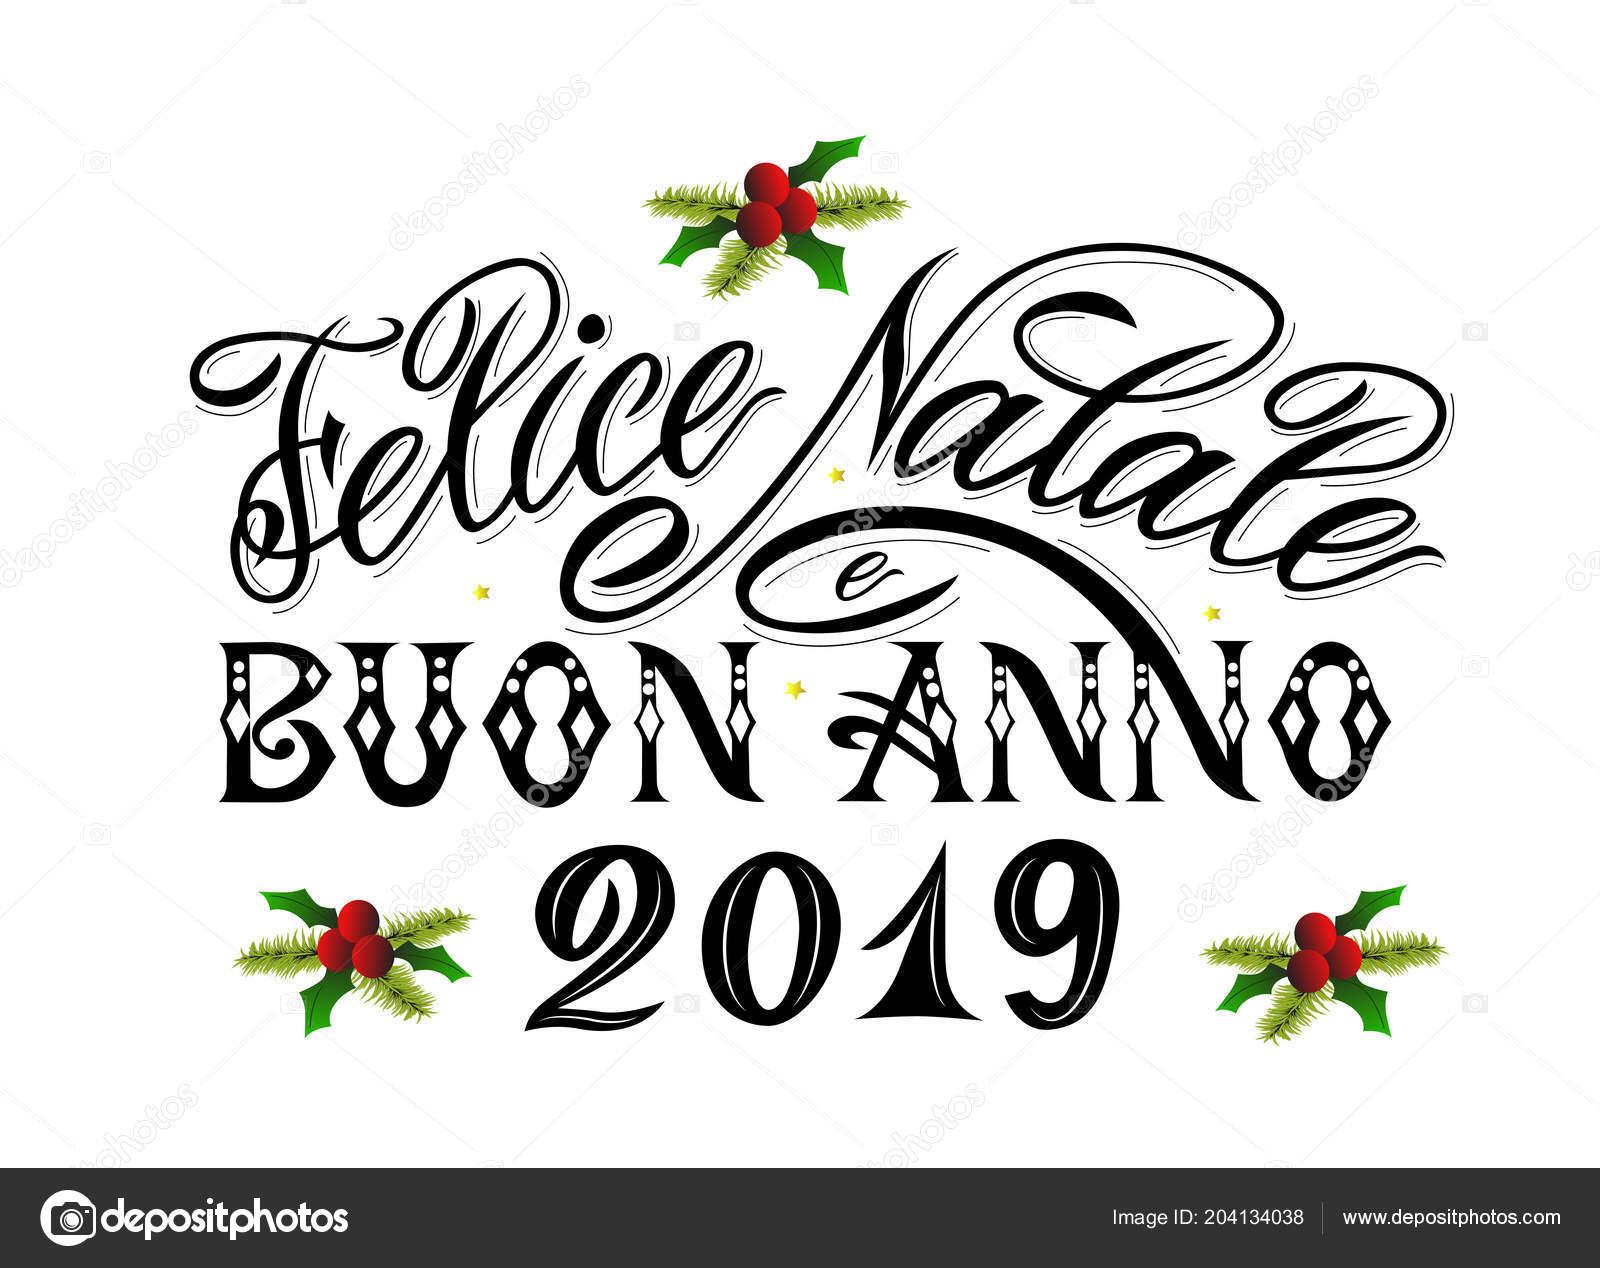 Merry Christmas Happy New Year 2019 Greetings Text Italian Language